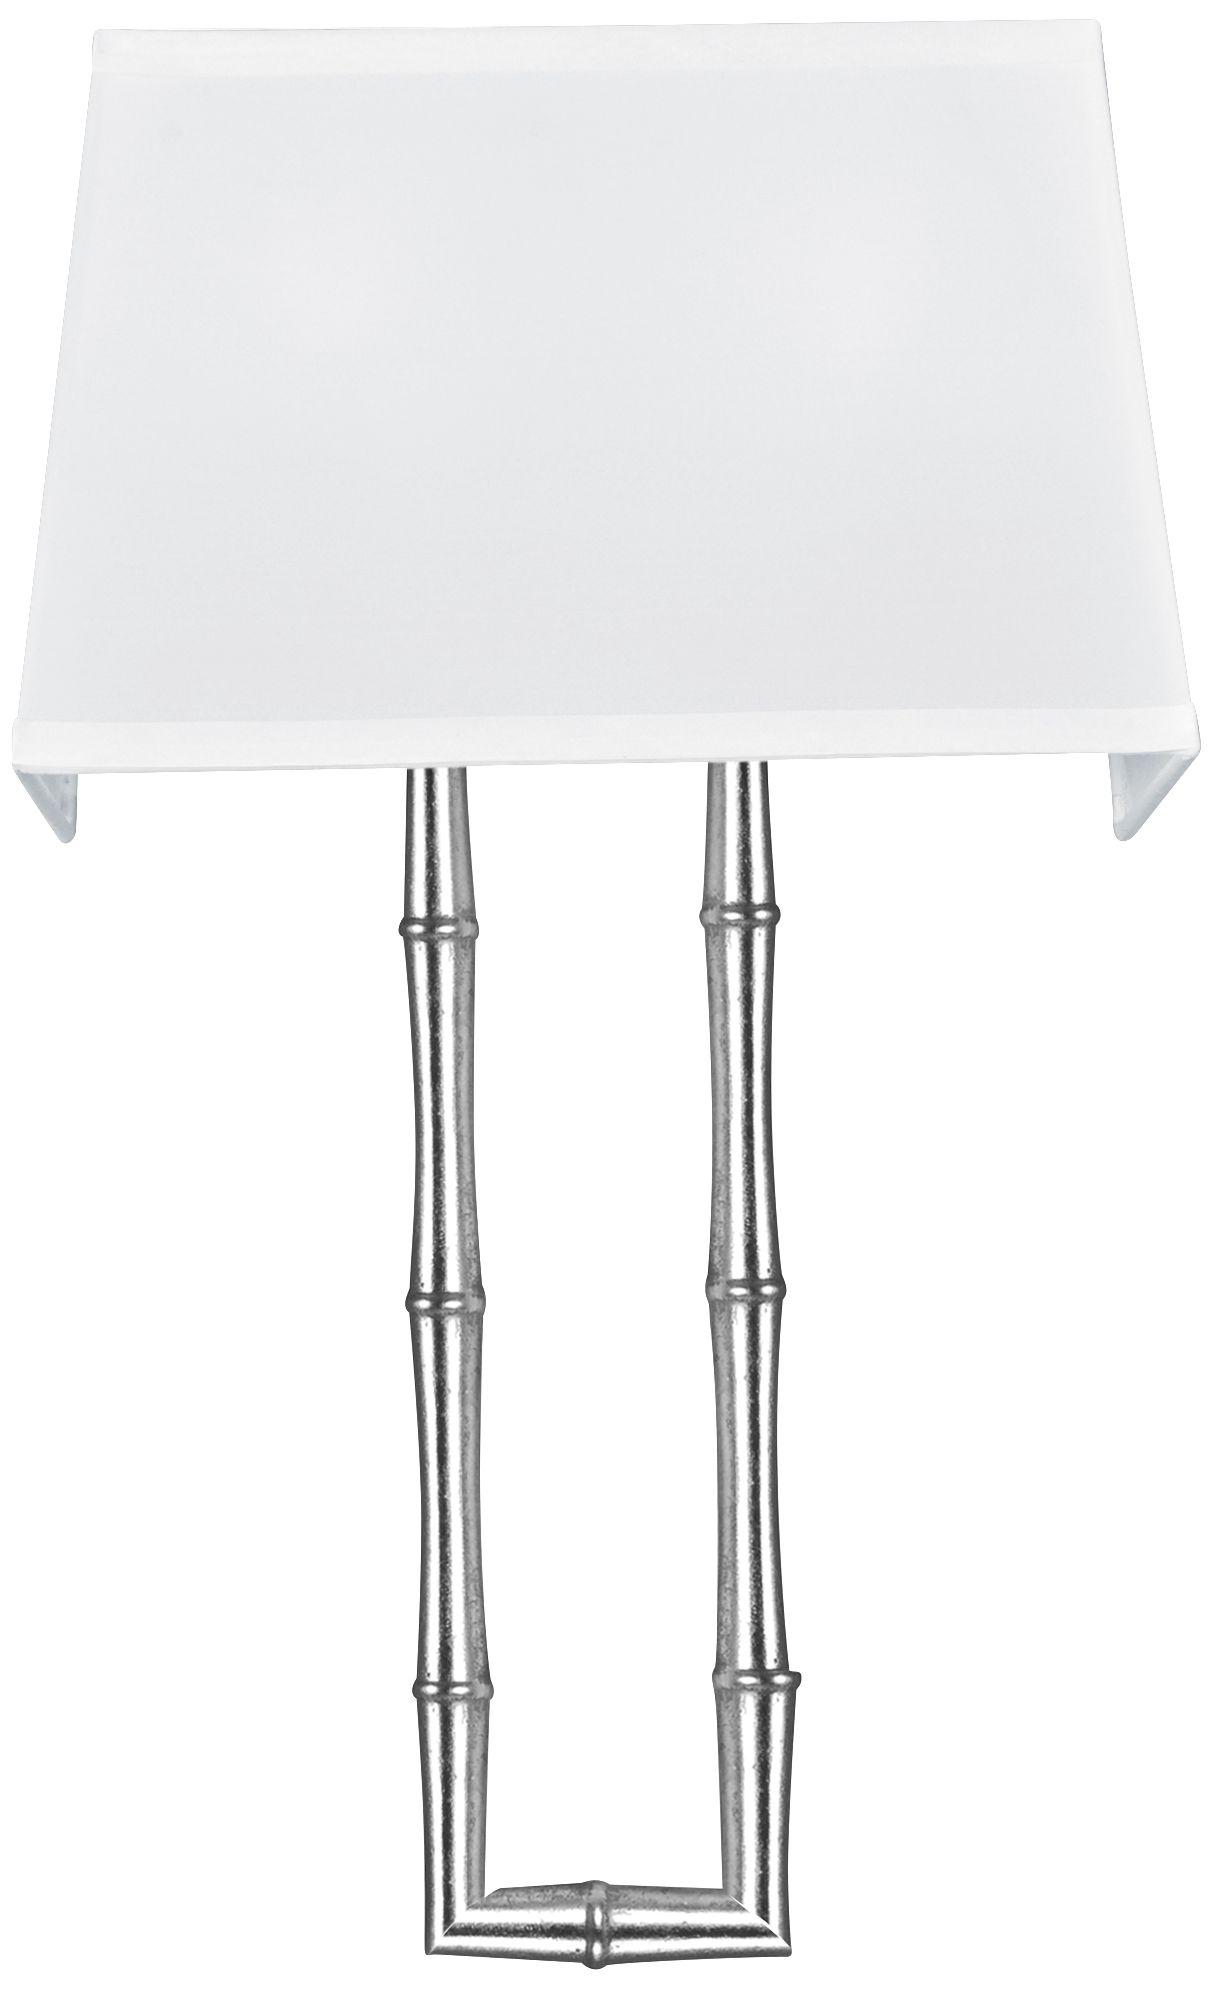 Crystorama Masefield 20  High Antique Silver 2-Light Sconce  sc 1 st  L&s Plus & Asian Sconces | Lamps Plus azcodes.com